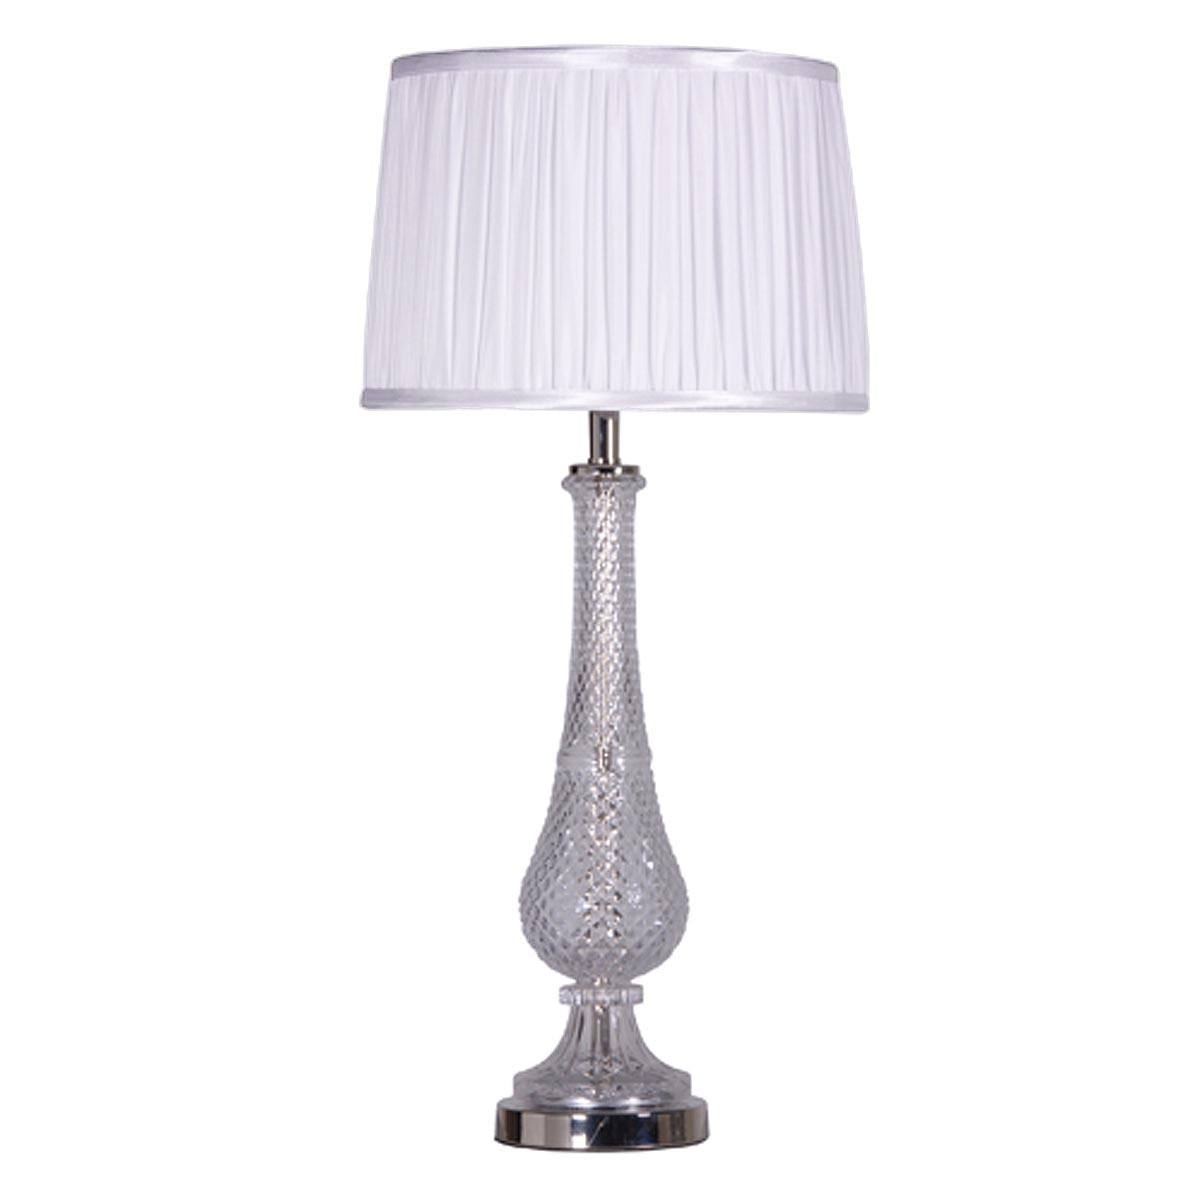 glass bedroom lamp photo - 8